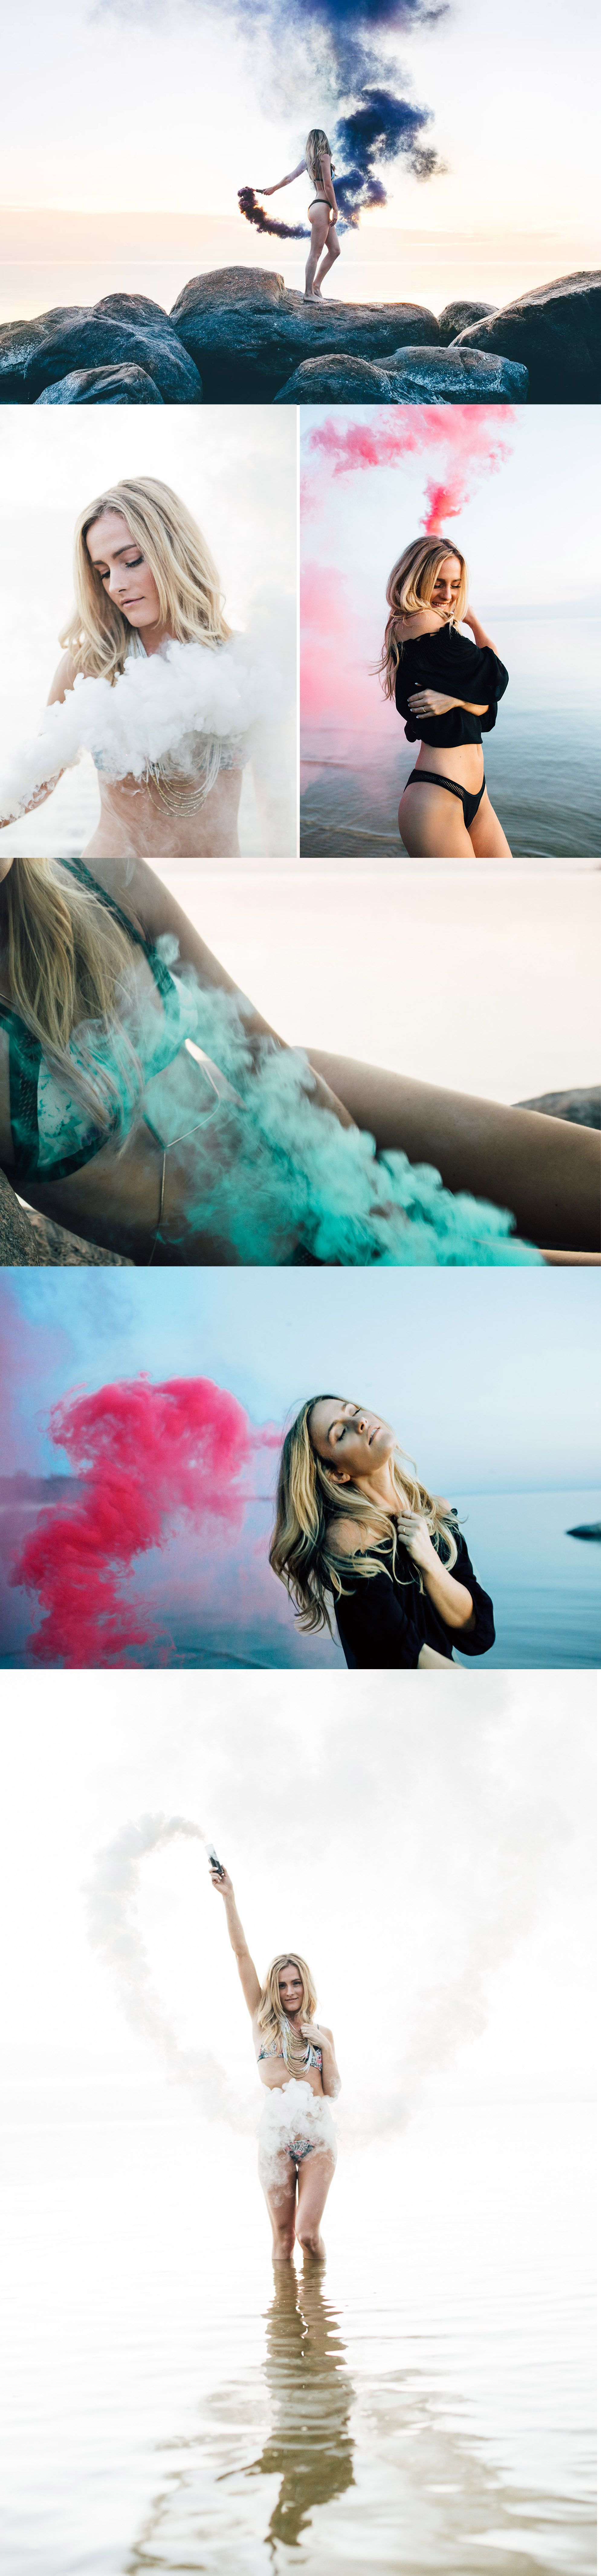 Smoke Bomb Photography Beach - Pantel Photography                                                                                                                                                     More